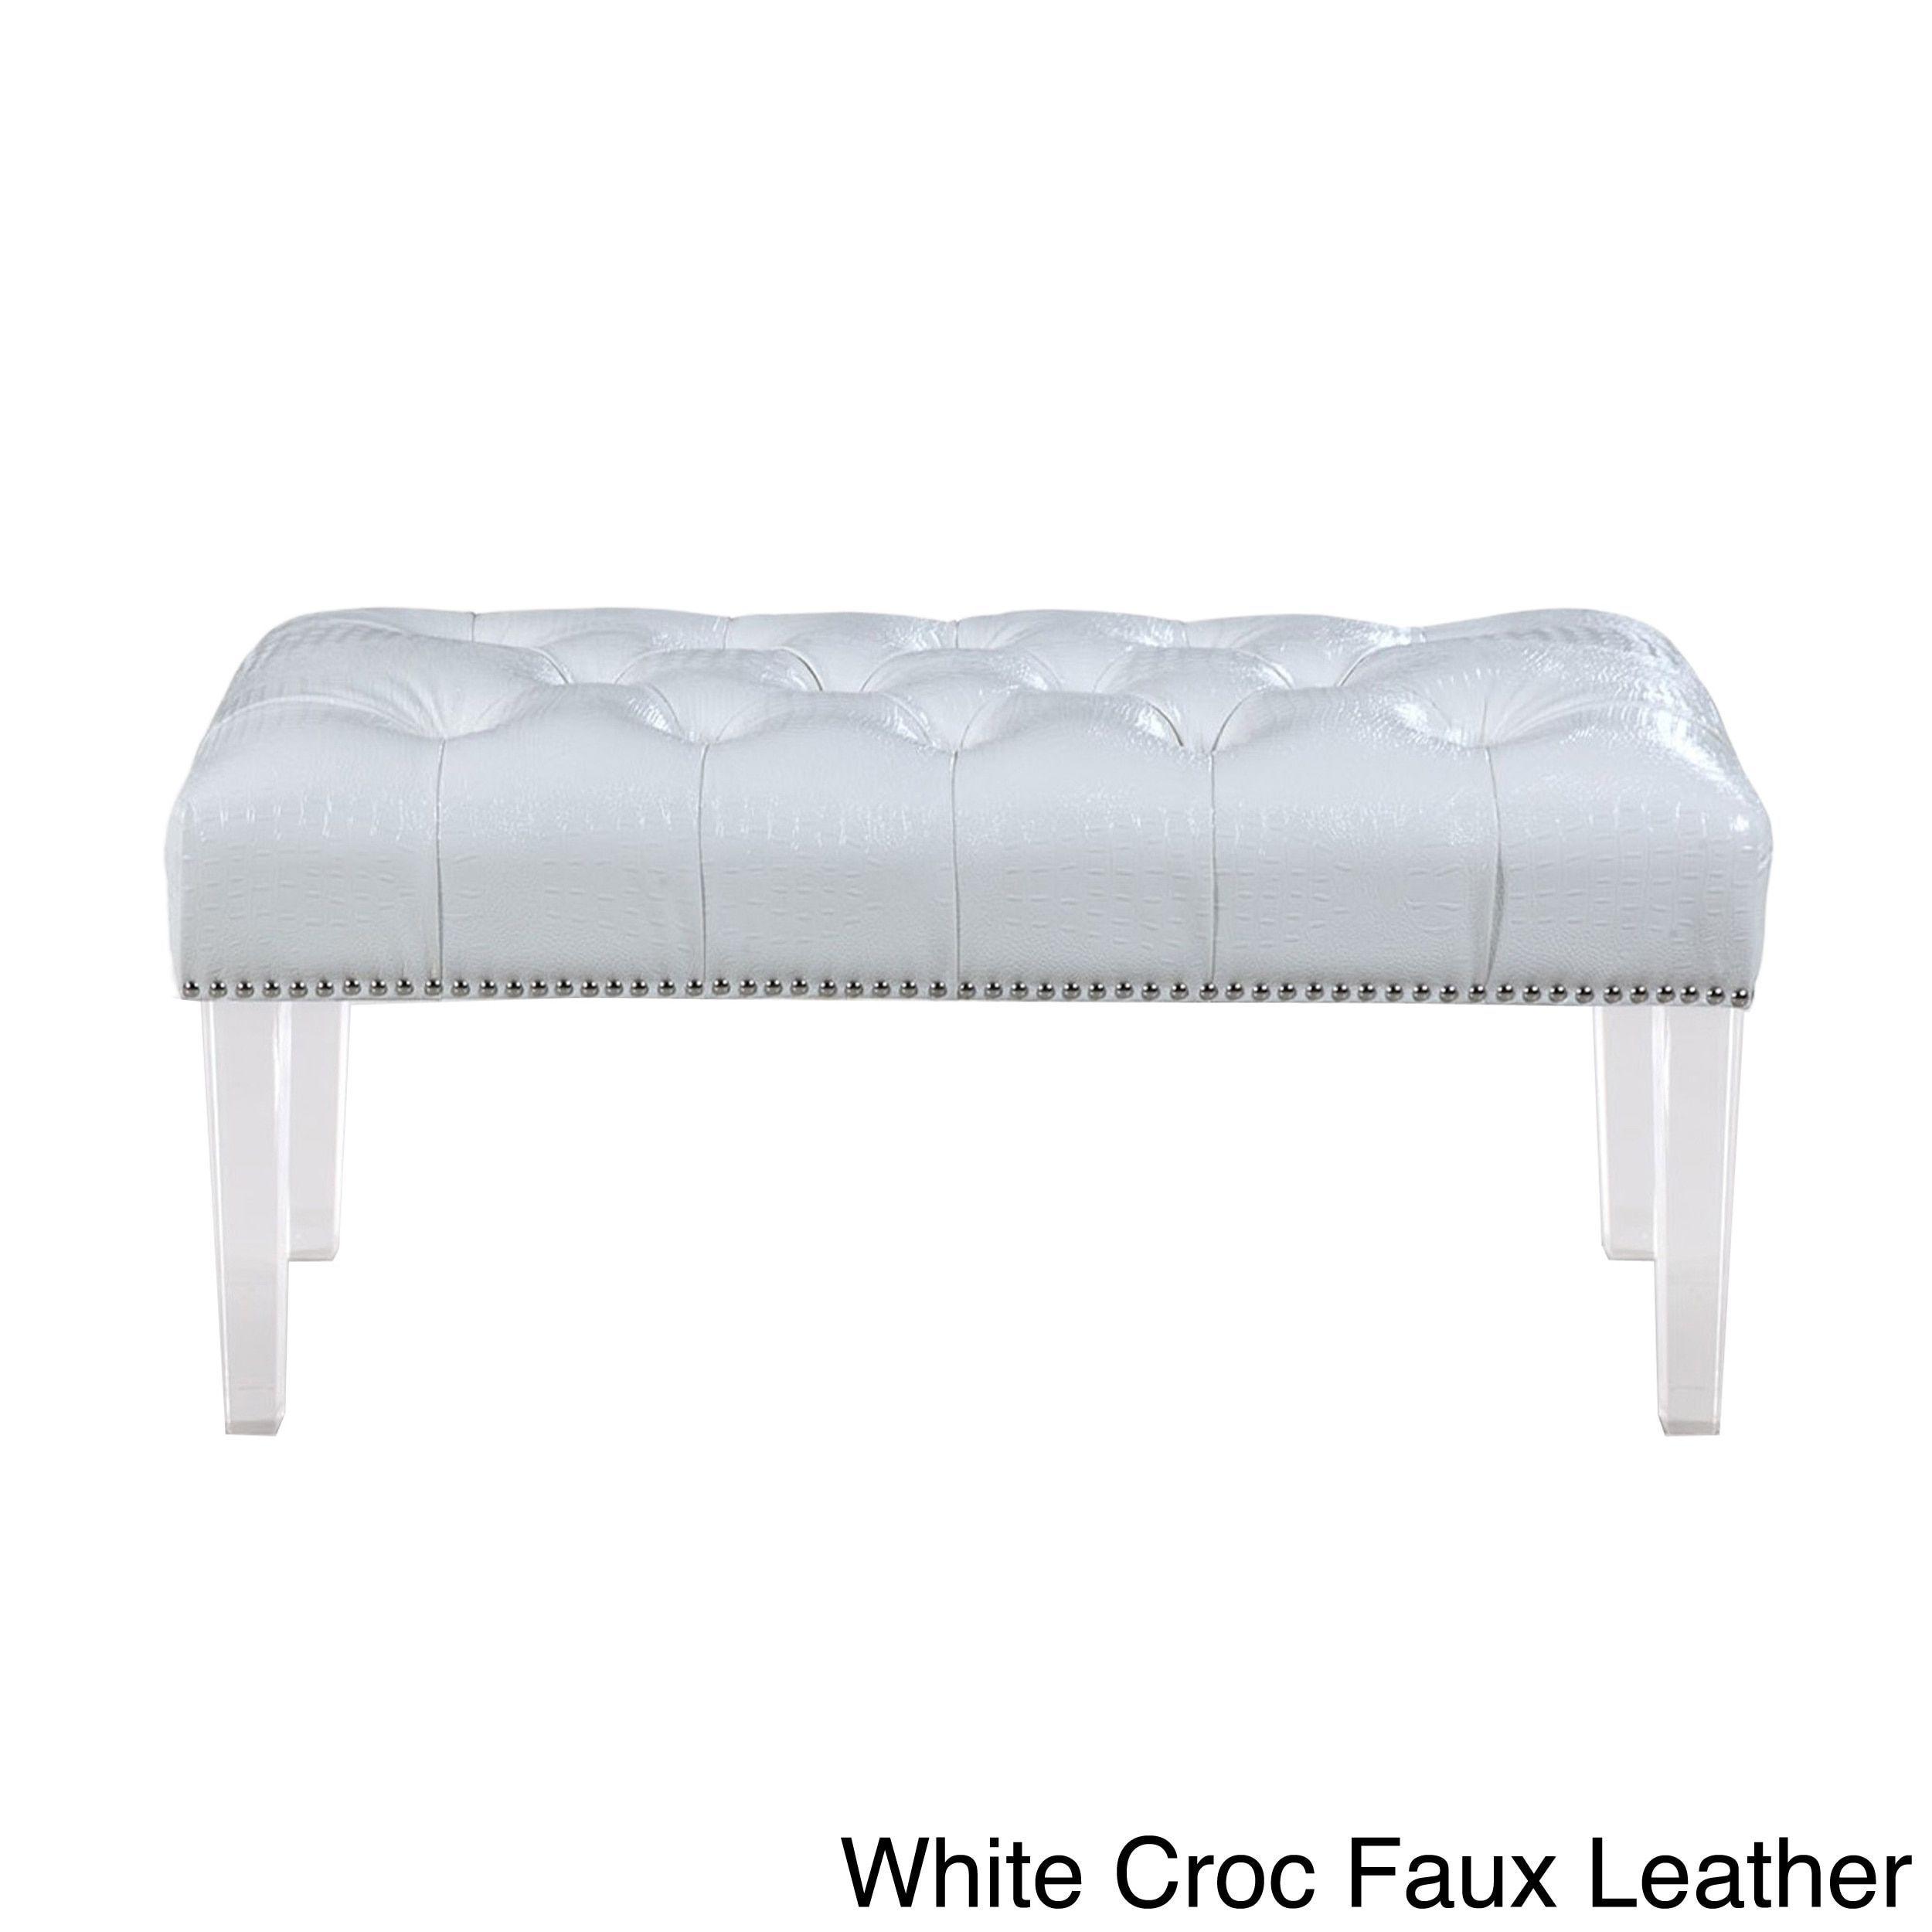 Terrific Chic Home Odette Button Tufted Nailhead Ottoman Bench Theyellowbook Wood Chair Design Ideas Theyellowbookinfo